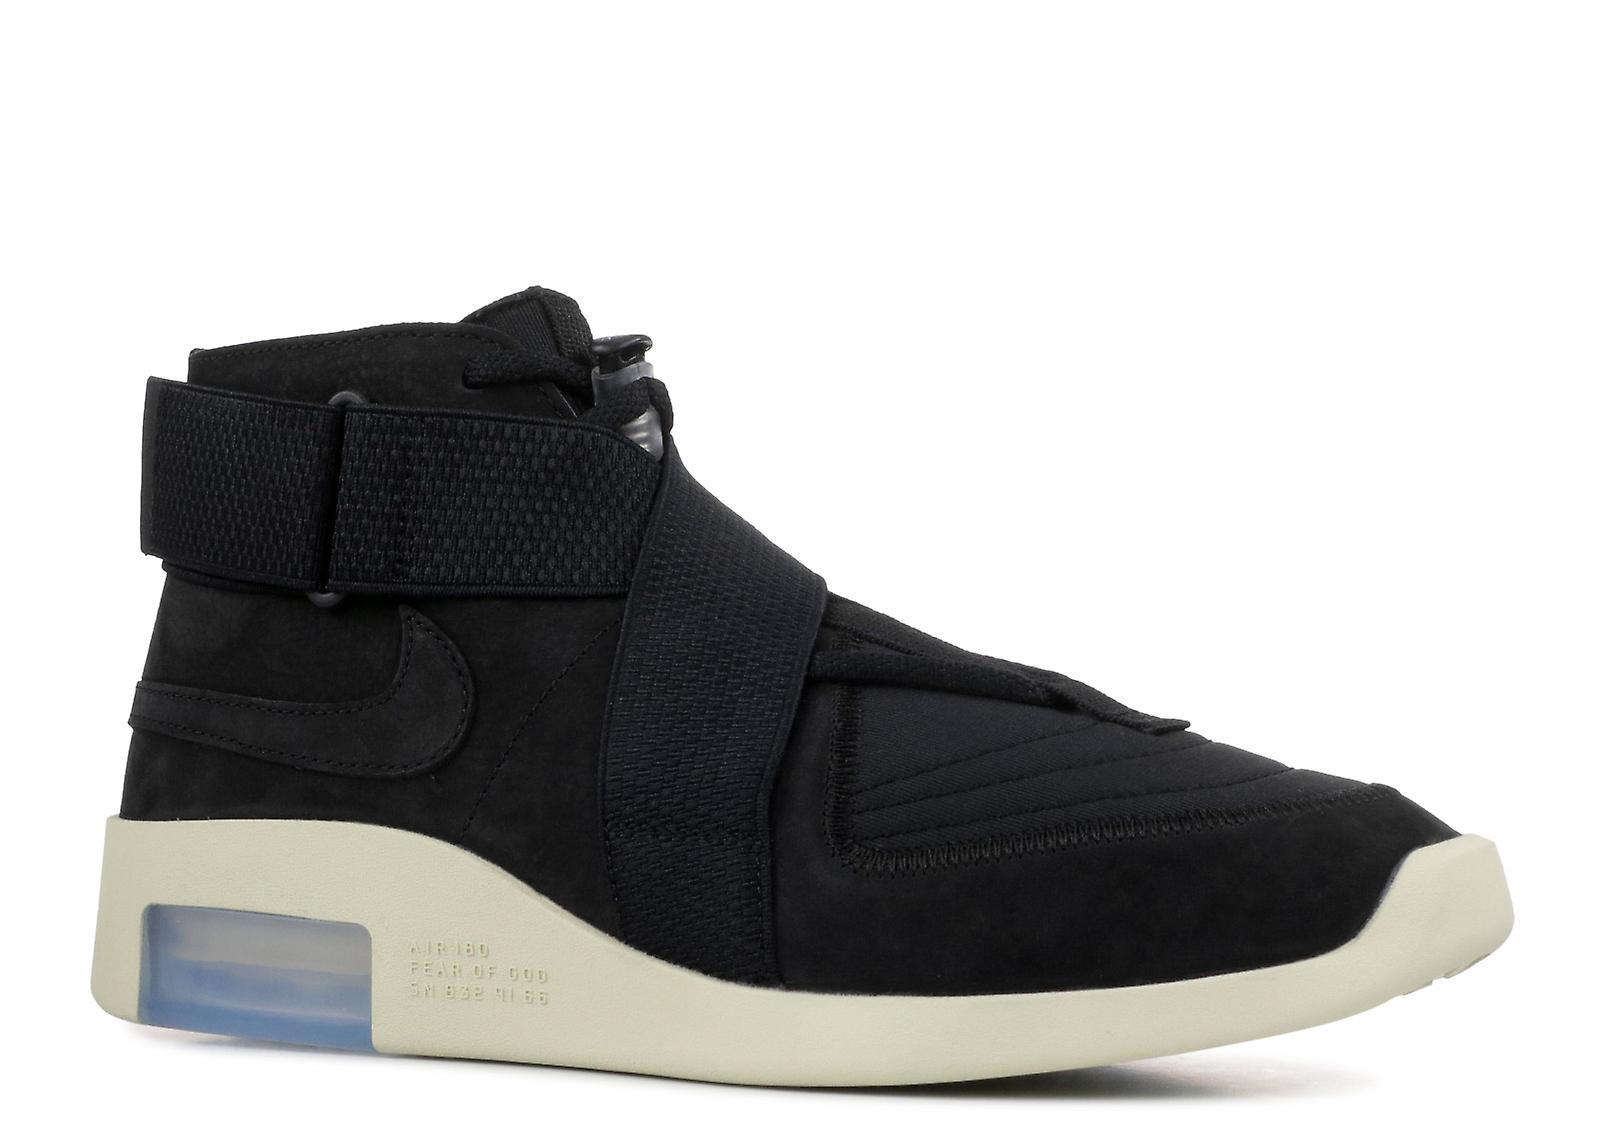 Nike AirFear of god 1 ' Air RAID ' At8087 002 sko | Fruugo NO